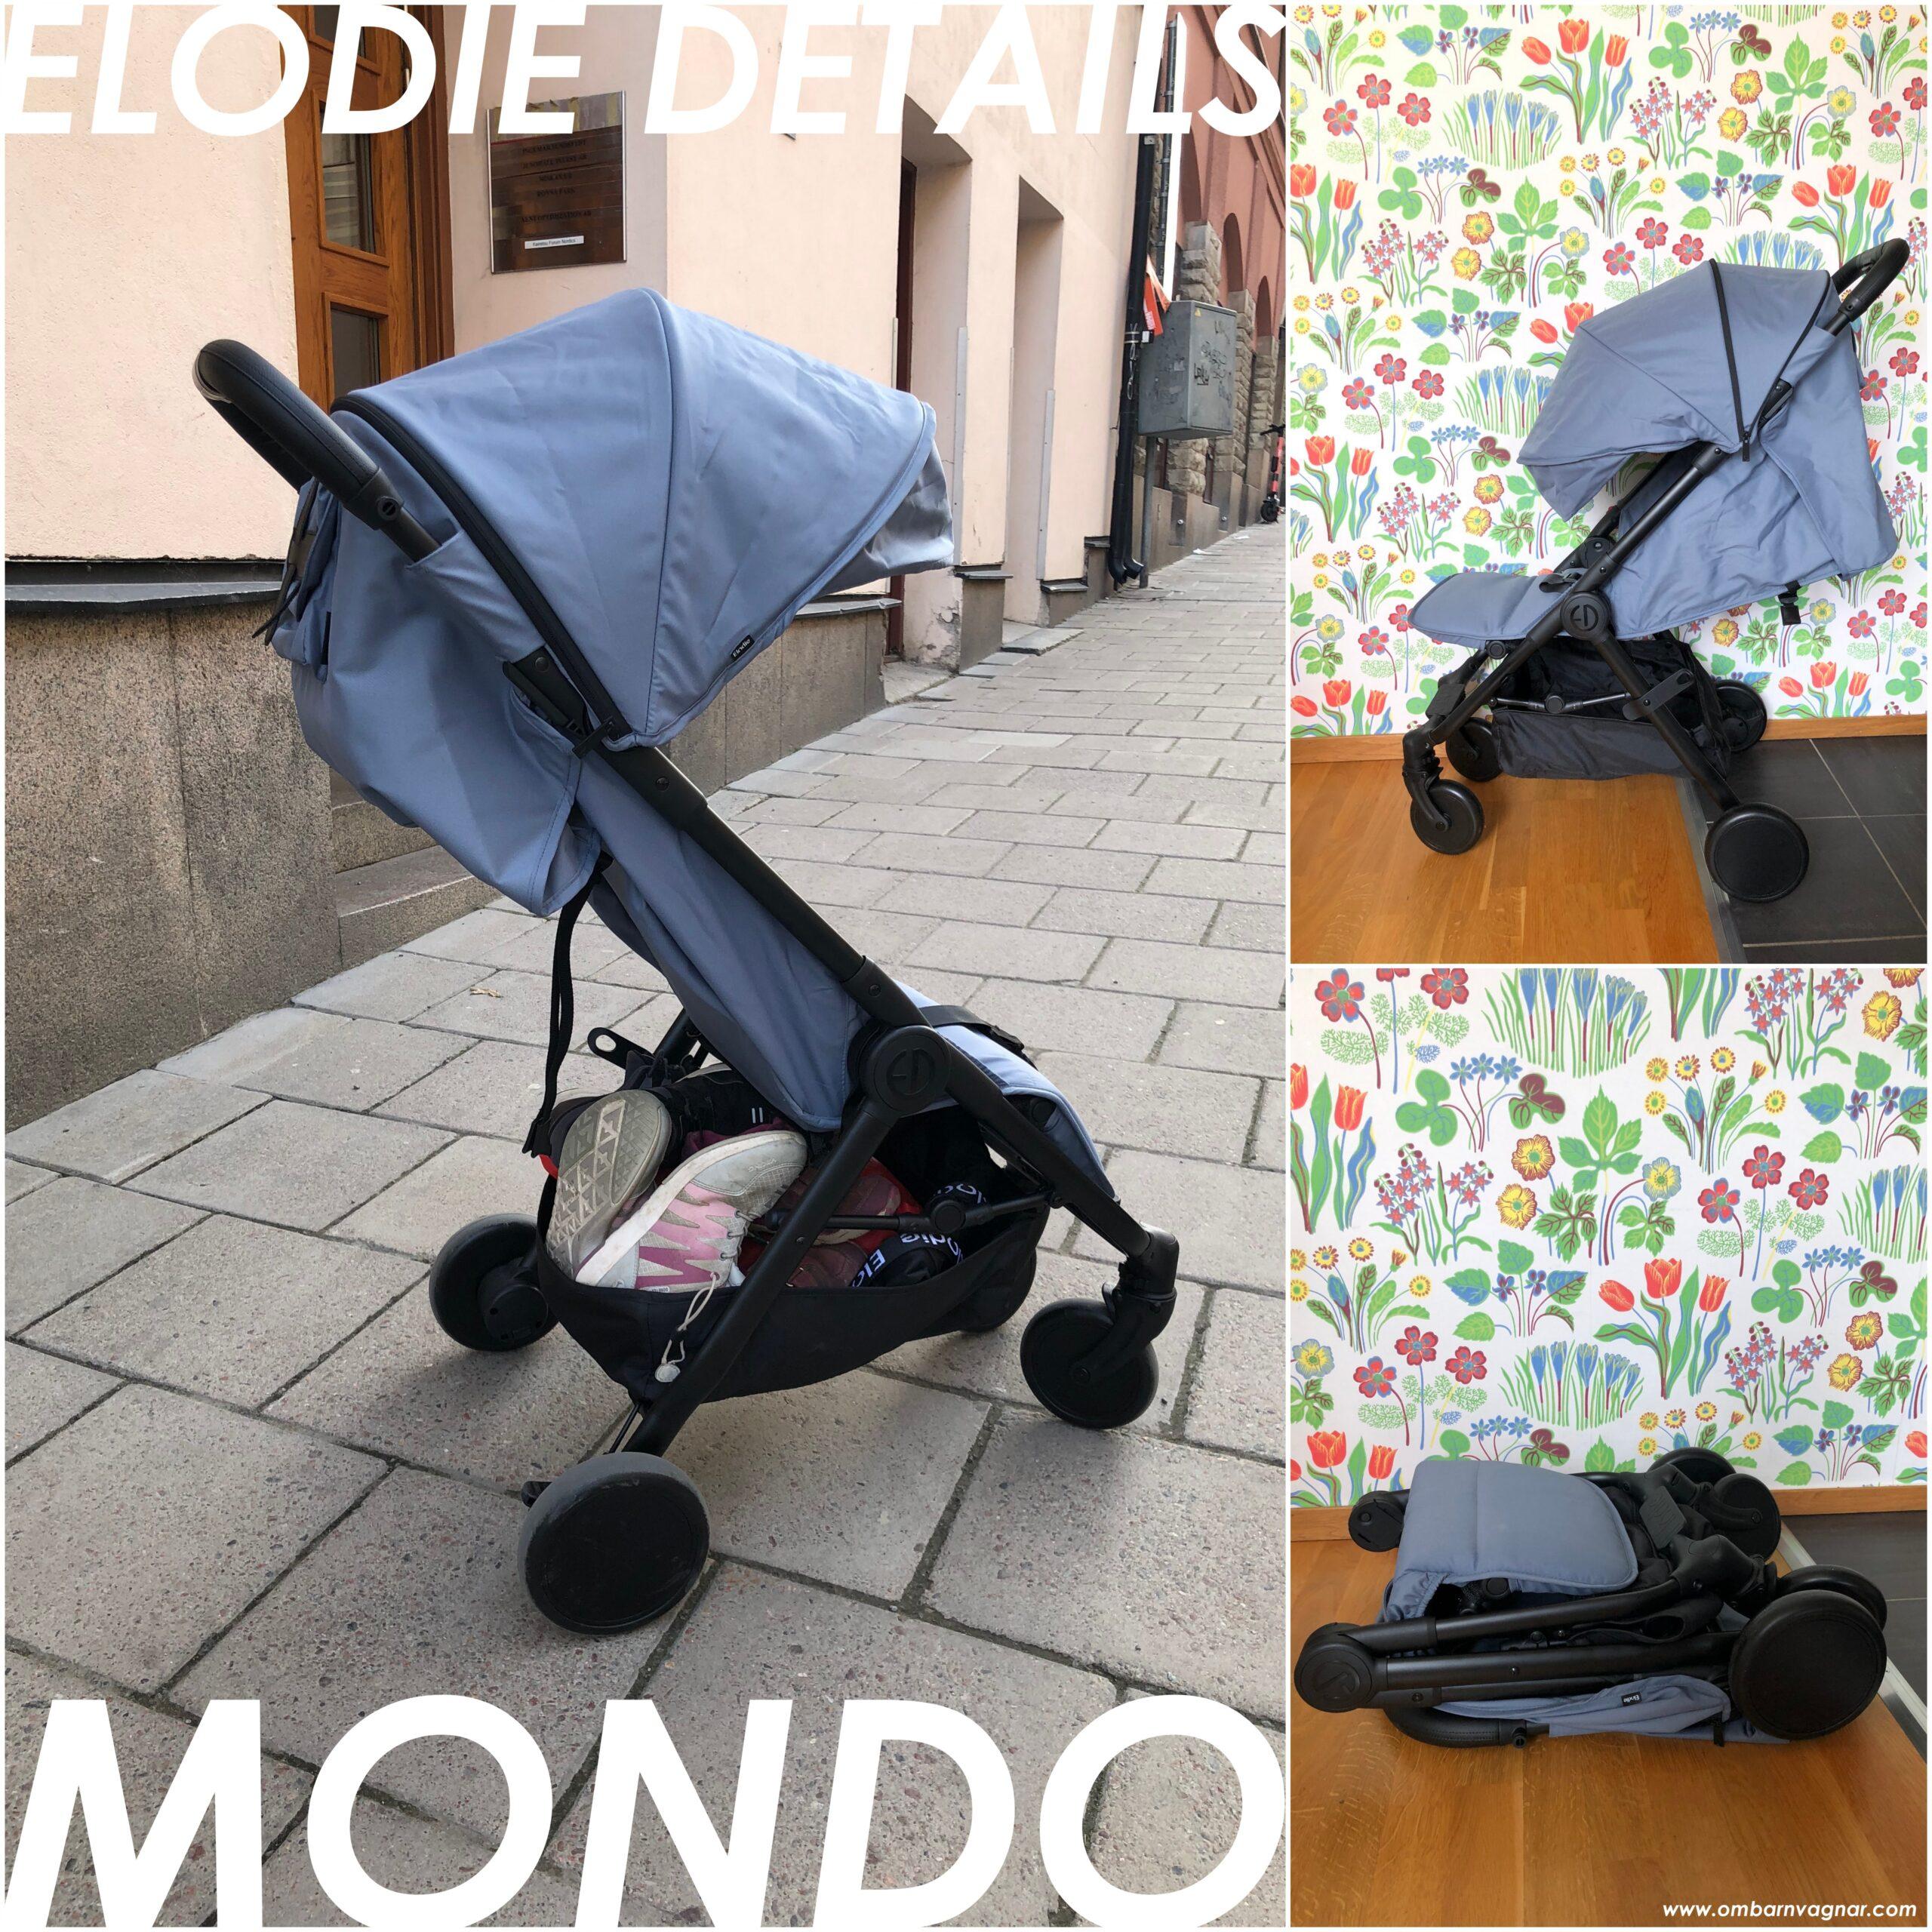 Recension av Elodie Details Mondo